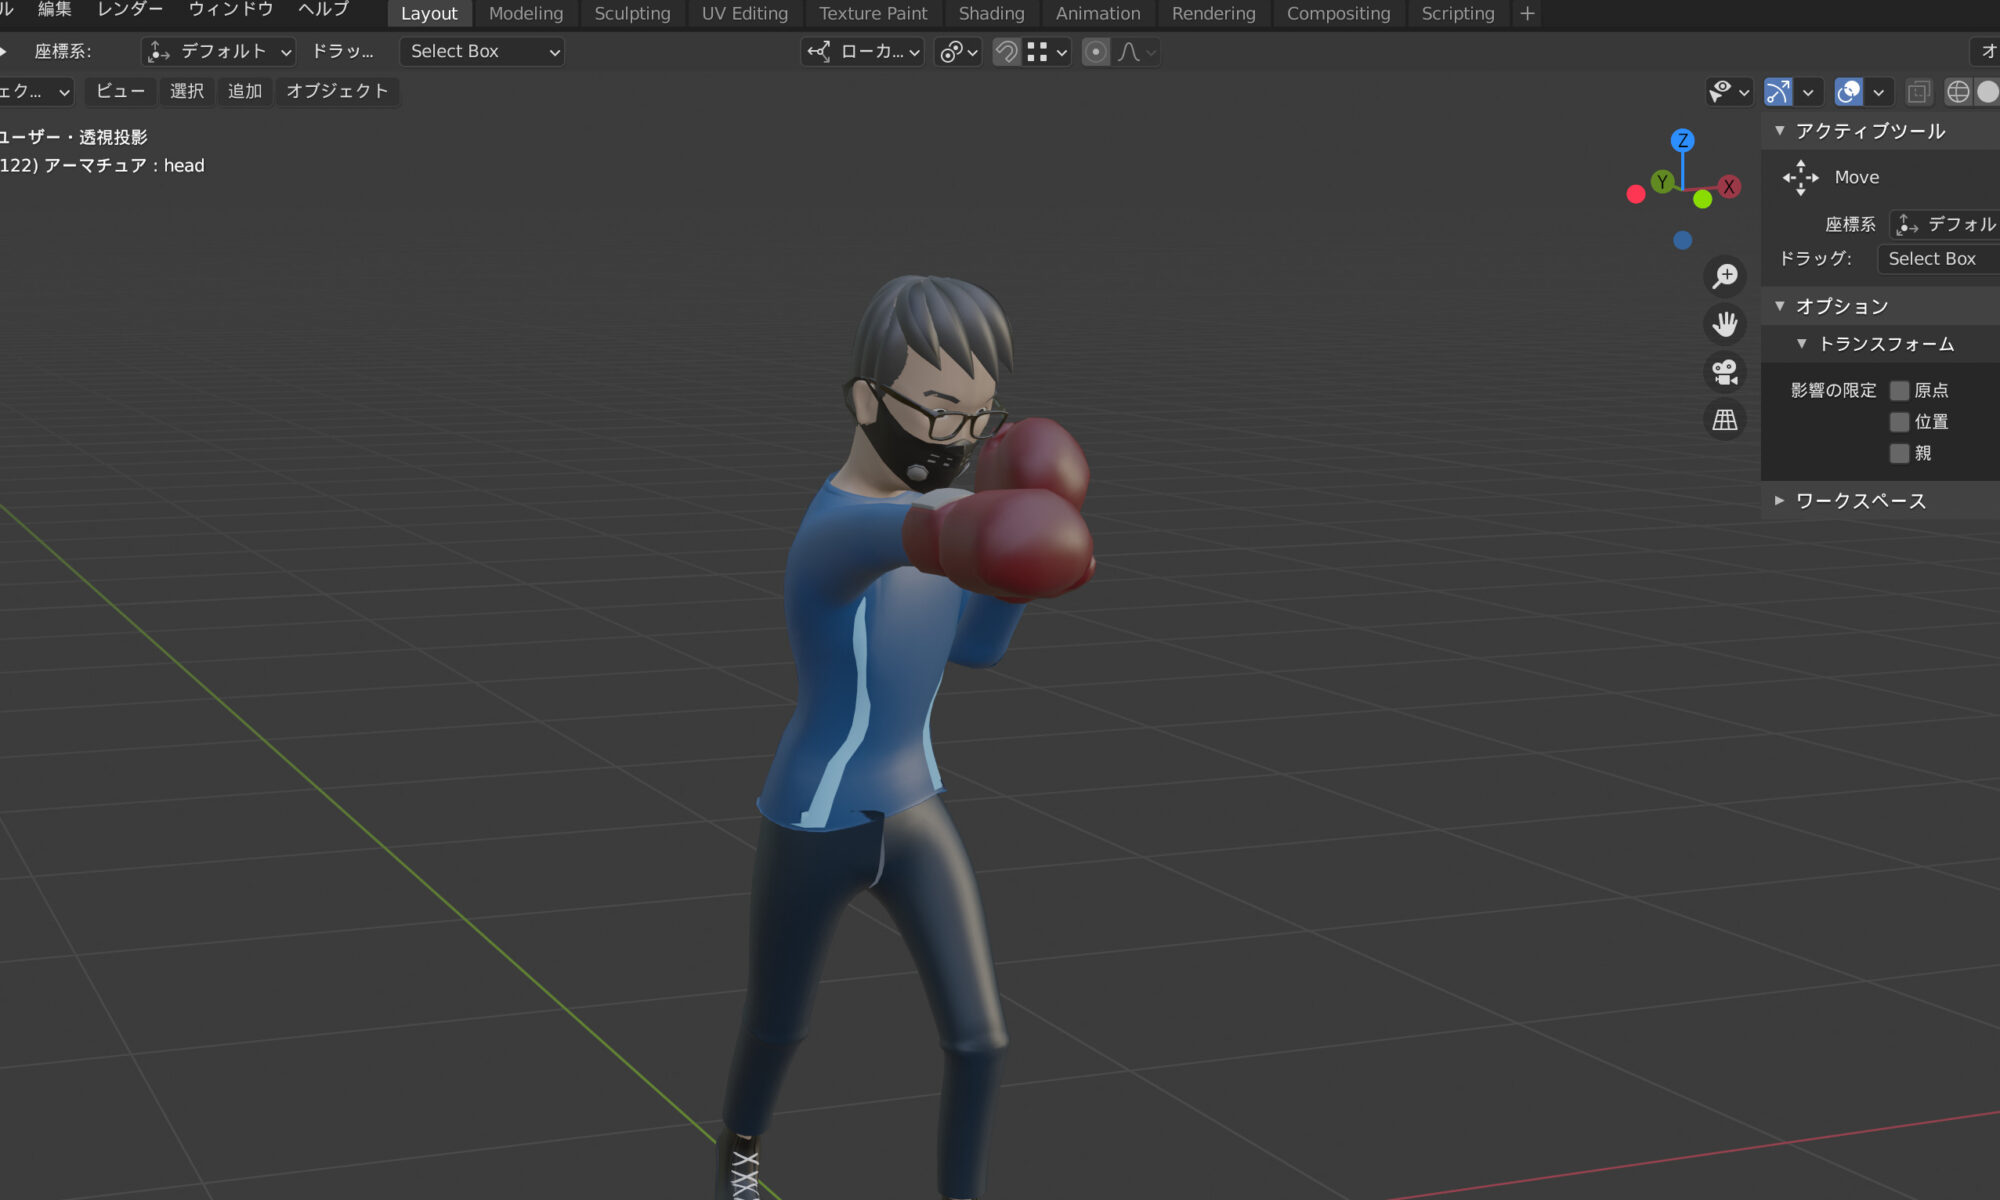 boxing modeling